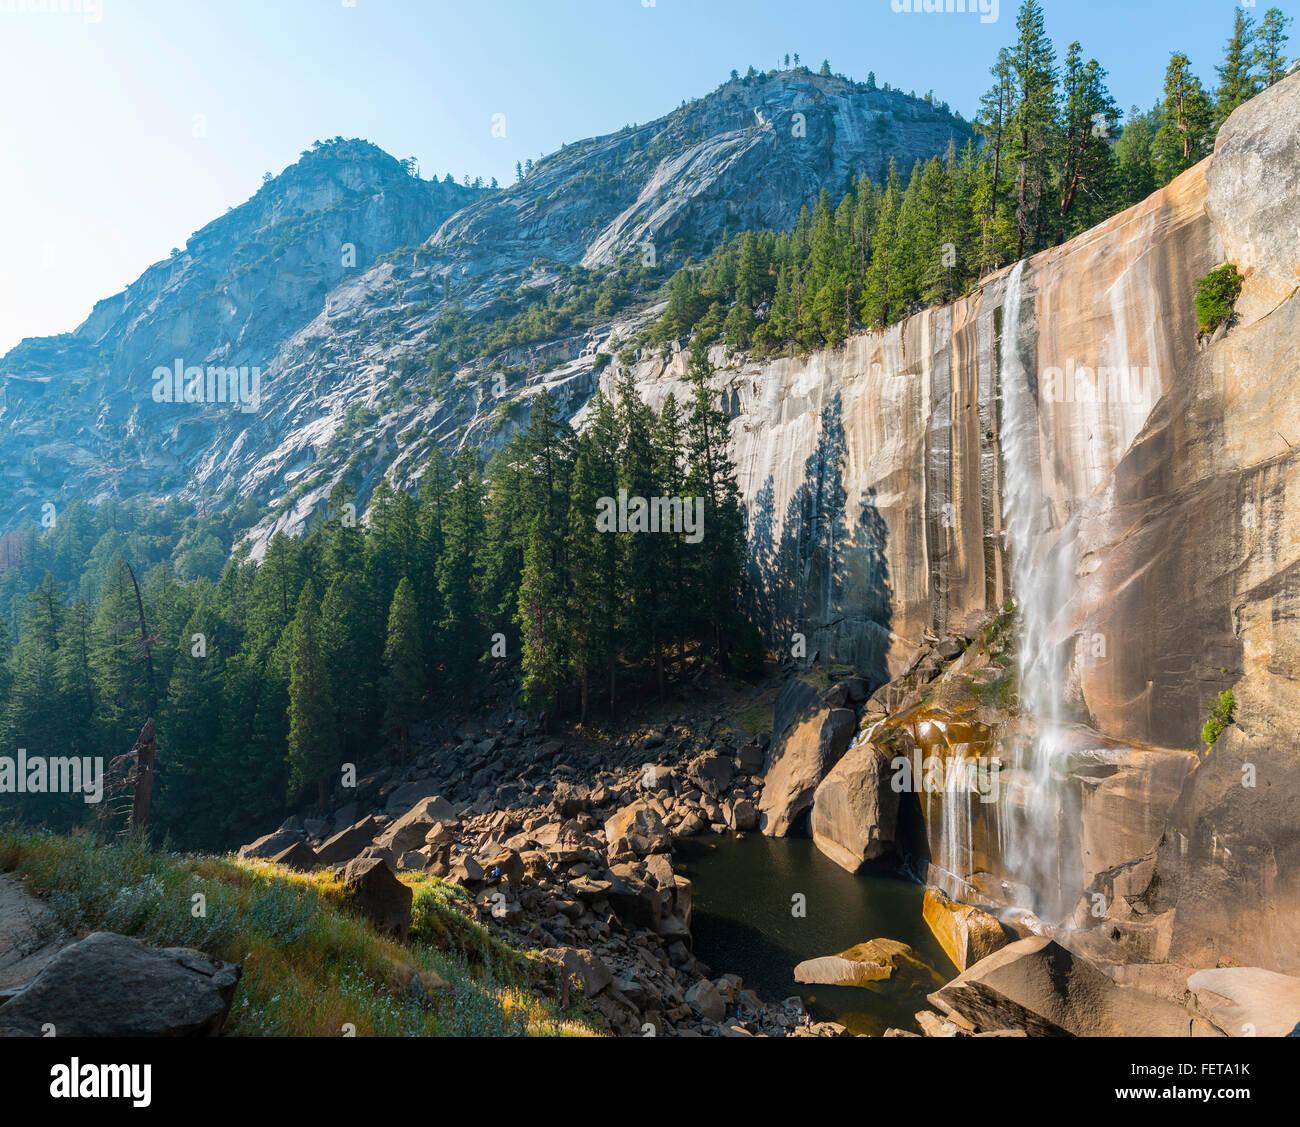 Vernal Fall, Yosemite Tal, Yosemite-Nationalpark, UNESO World Heritage Site, Kalifornien, USA Stockbild